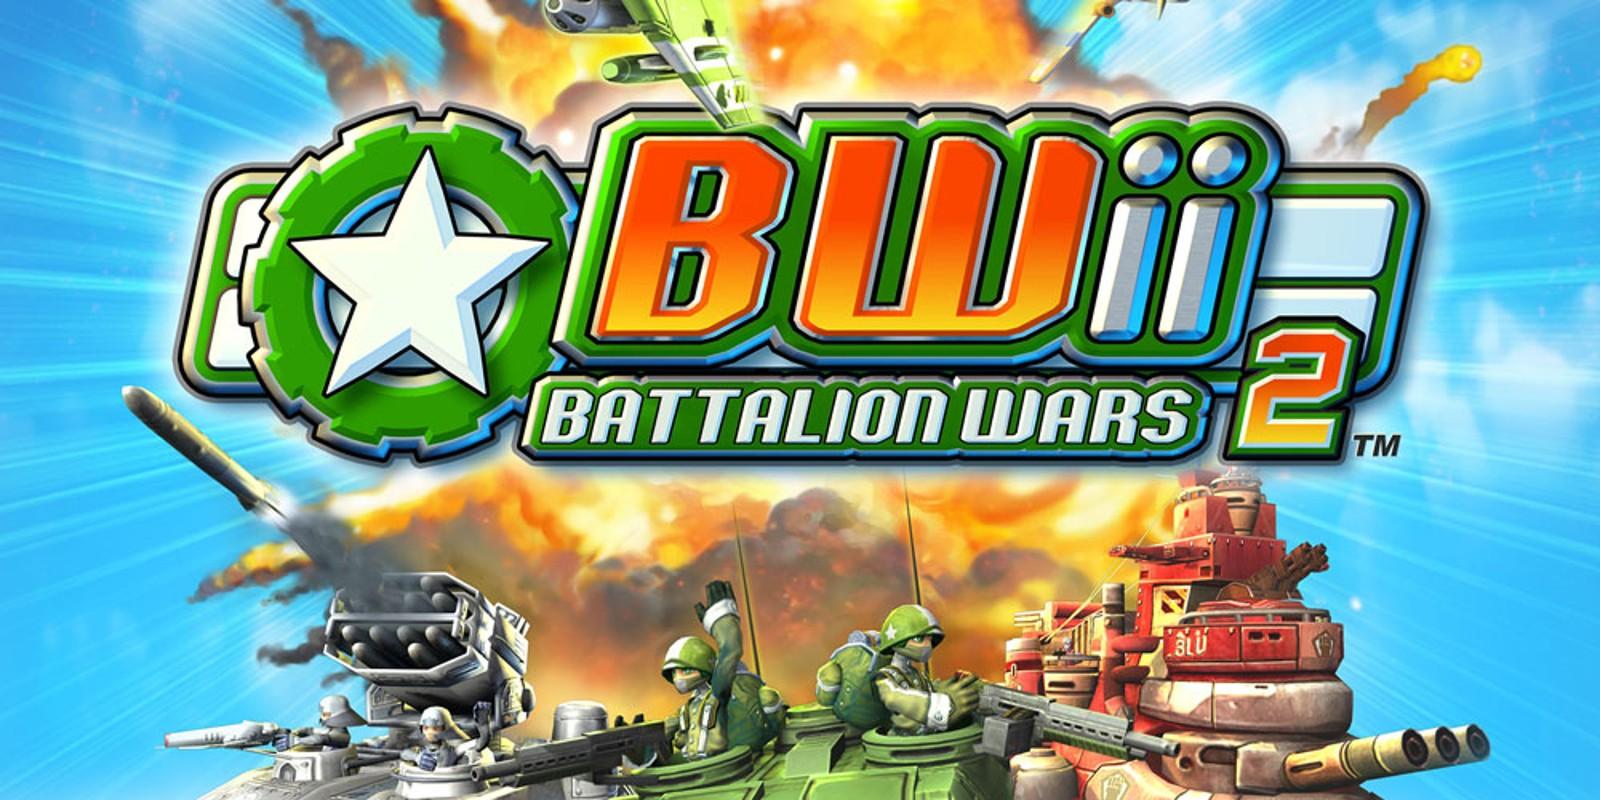 Battalion Wars Ii Wii Juegos Nintendo